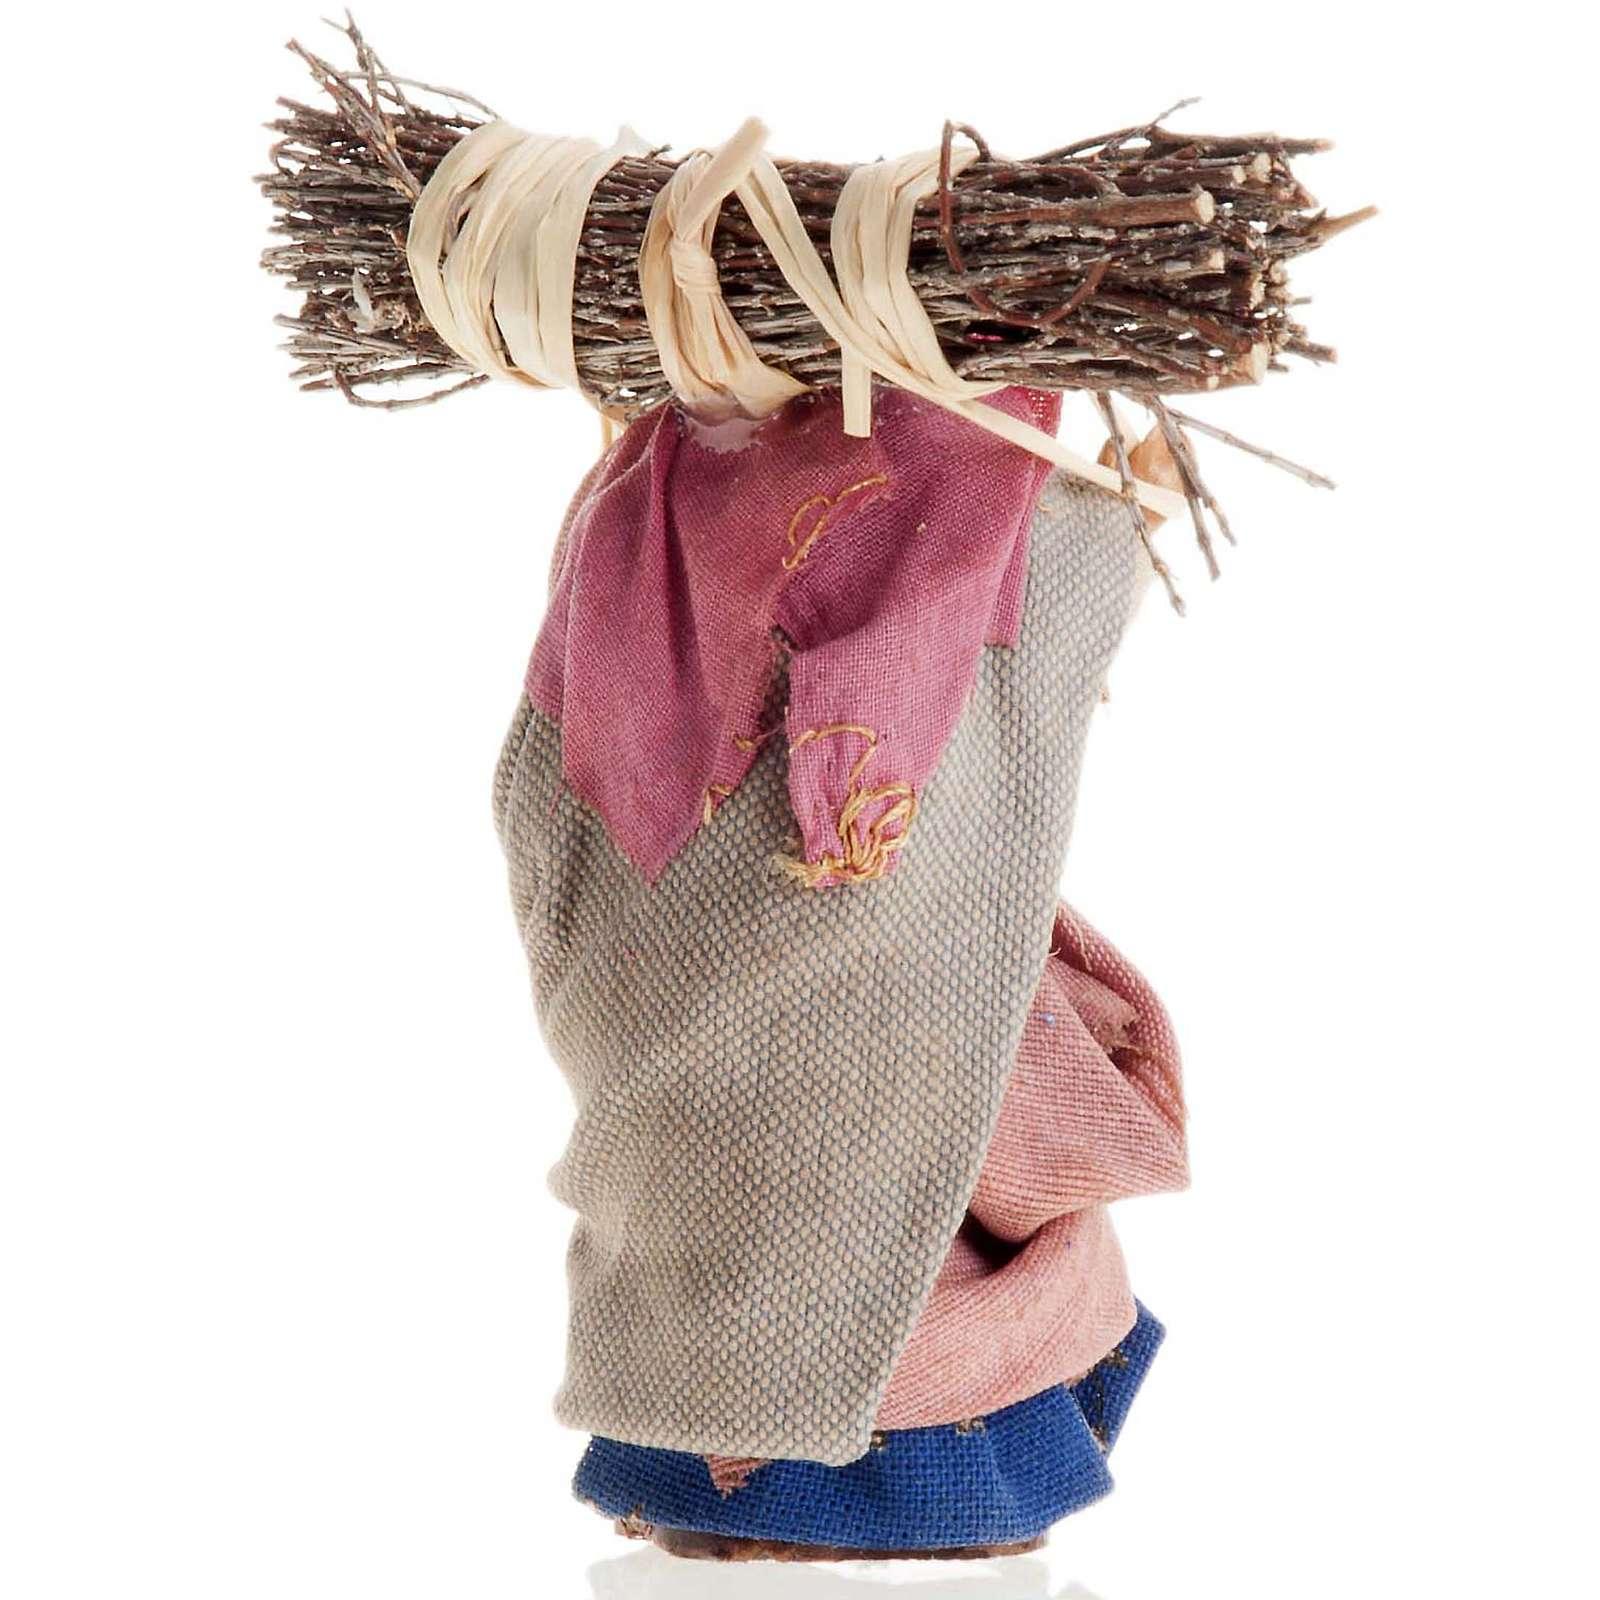 Neapolitan Nativity figurine, Old woman with wood bundle 8cm 4